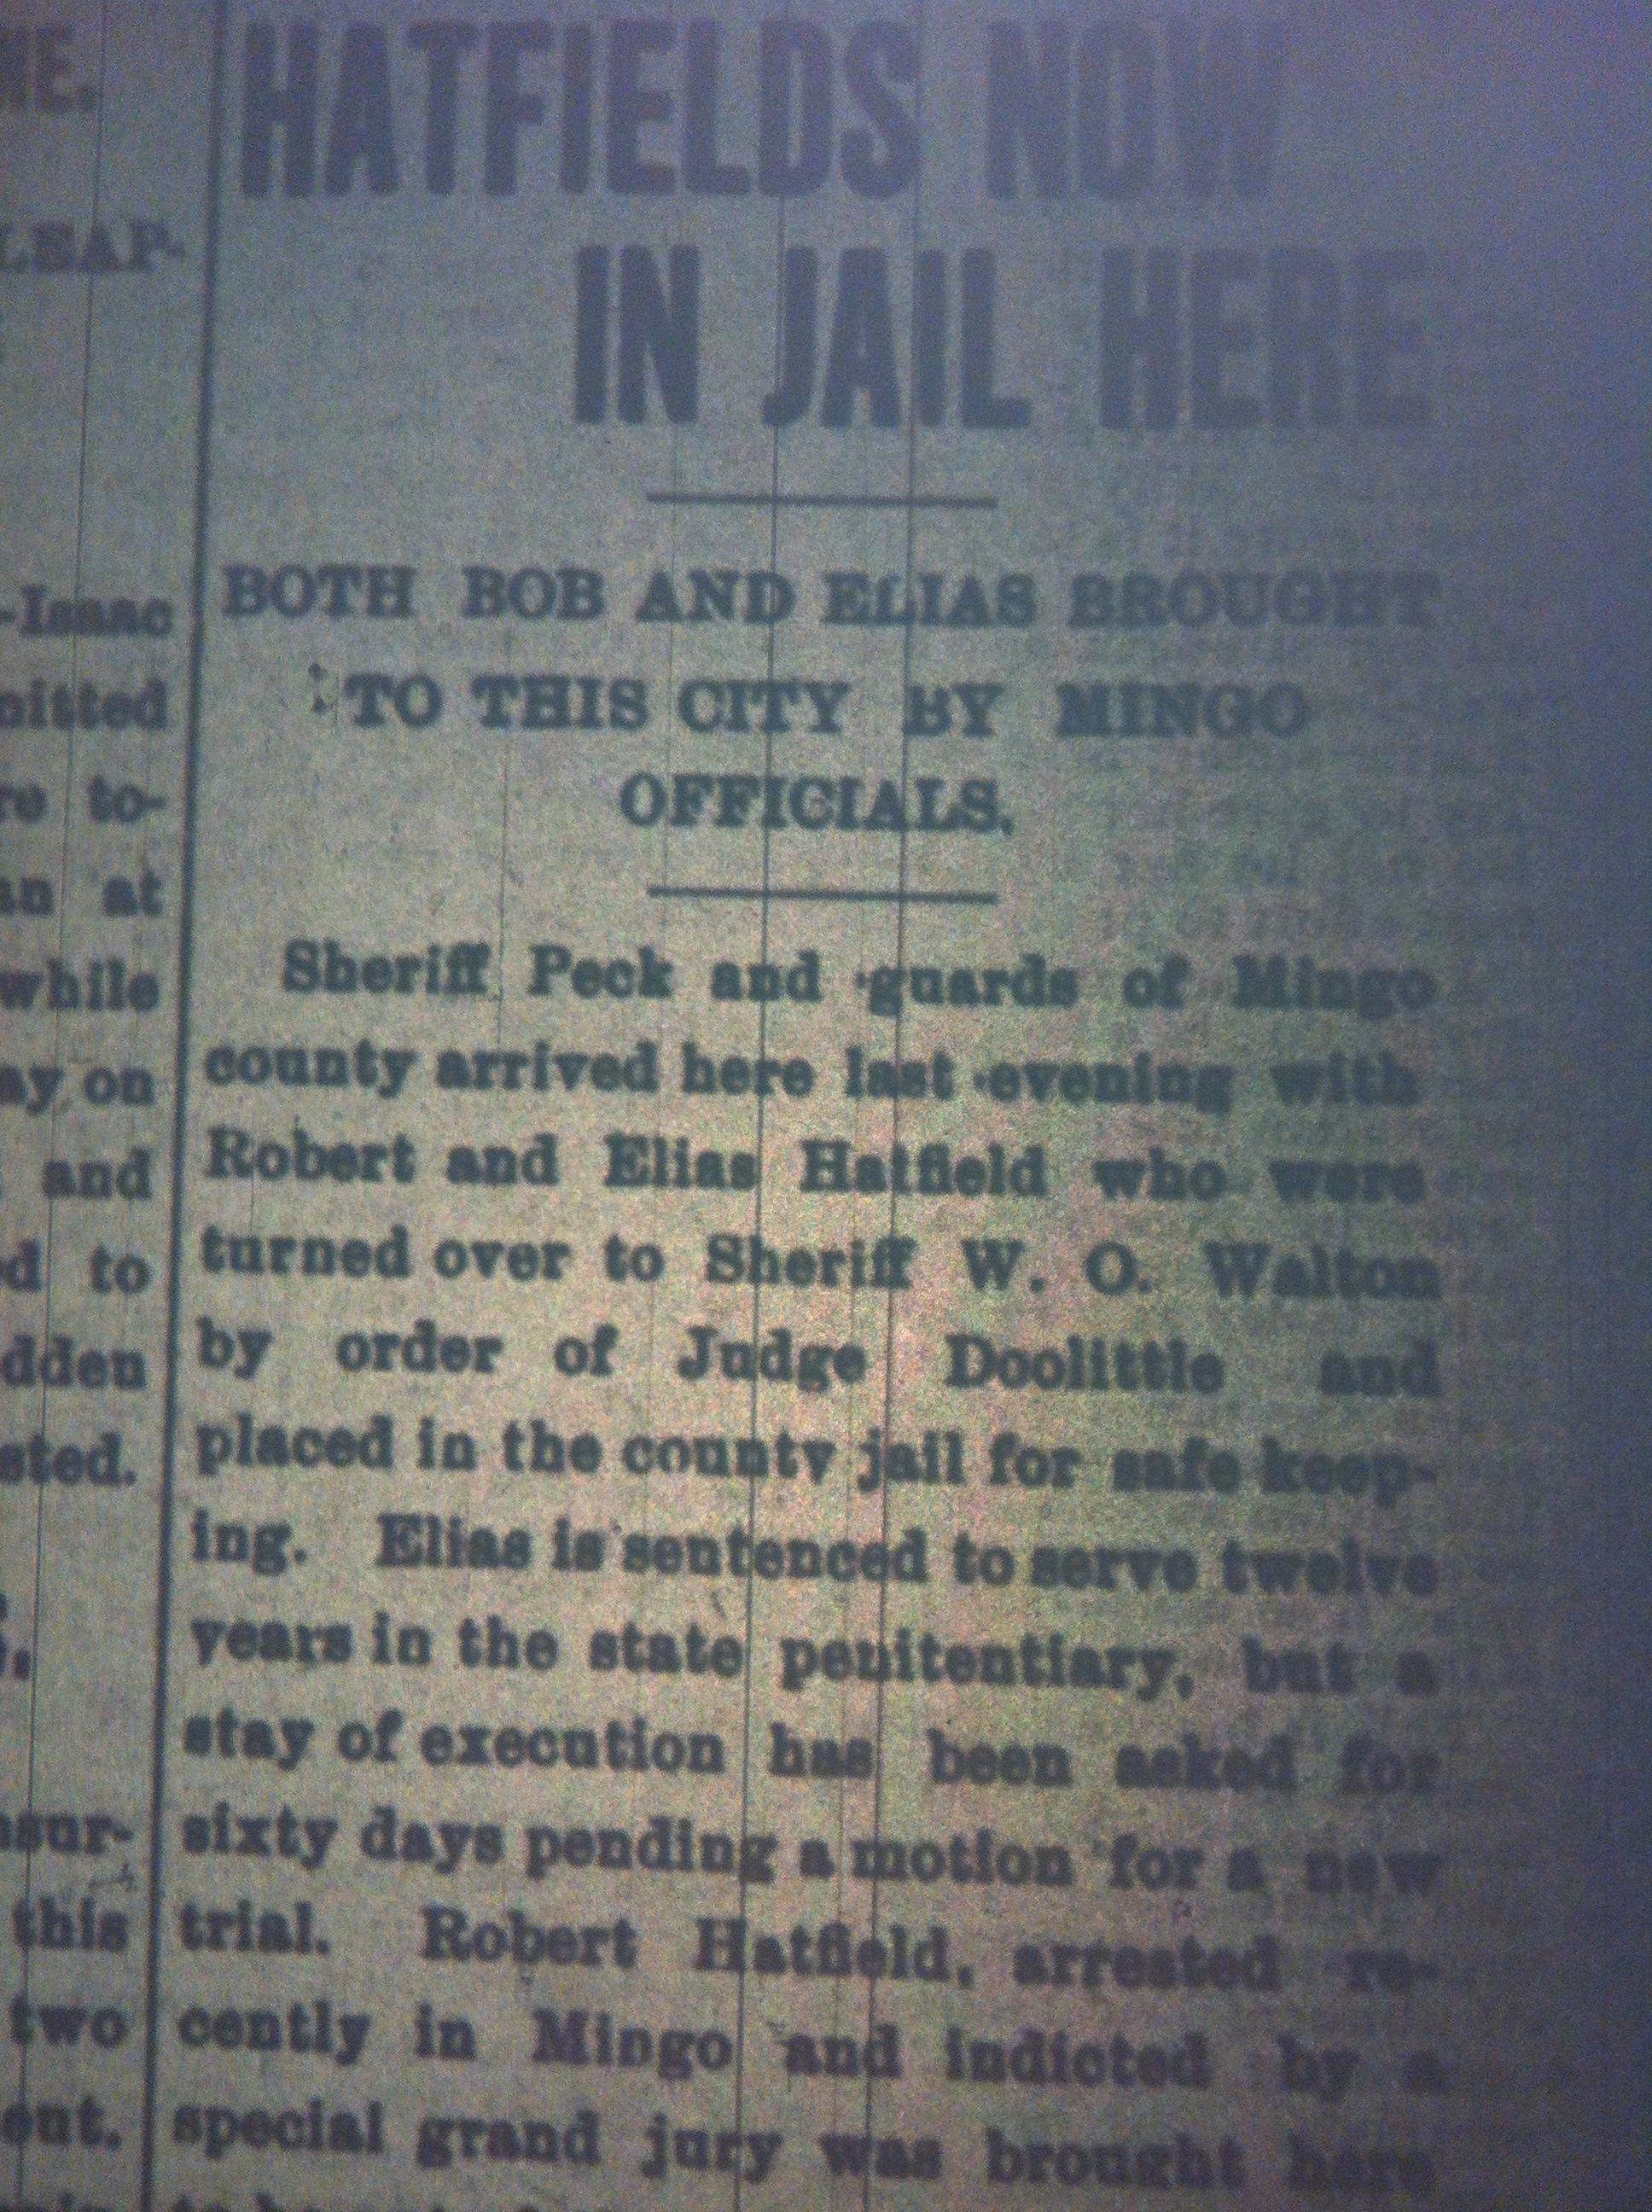 Bob and Elias Hatfield in Jail HA 09.22.1899 1